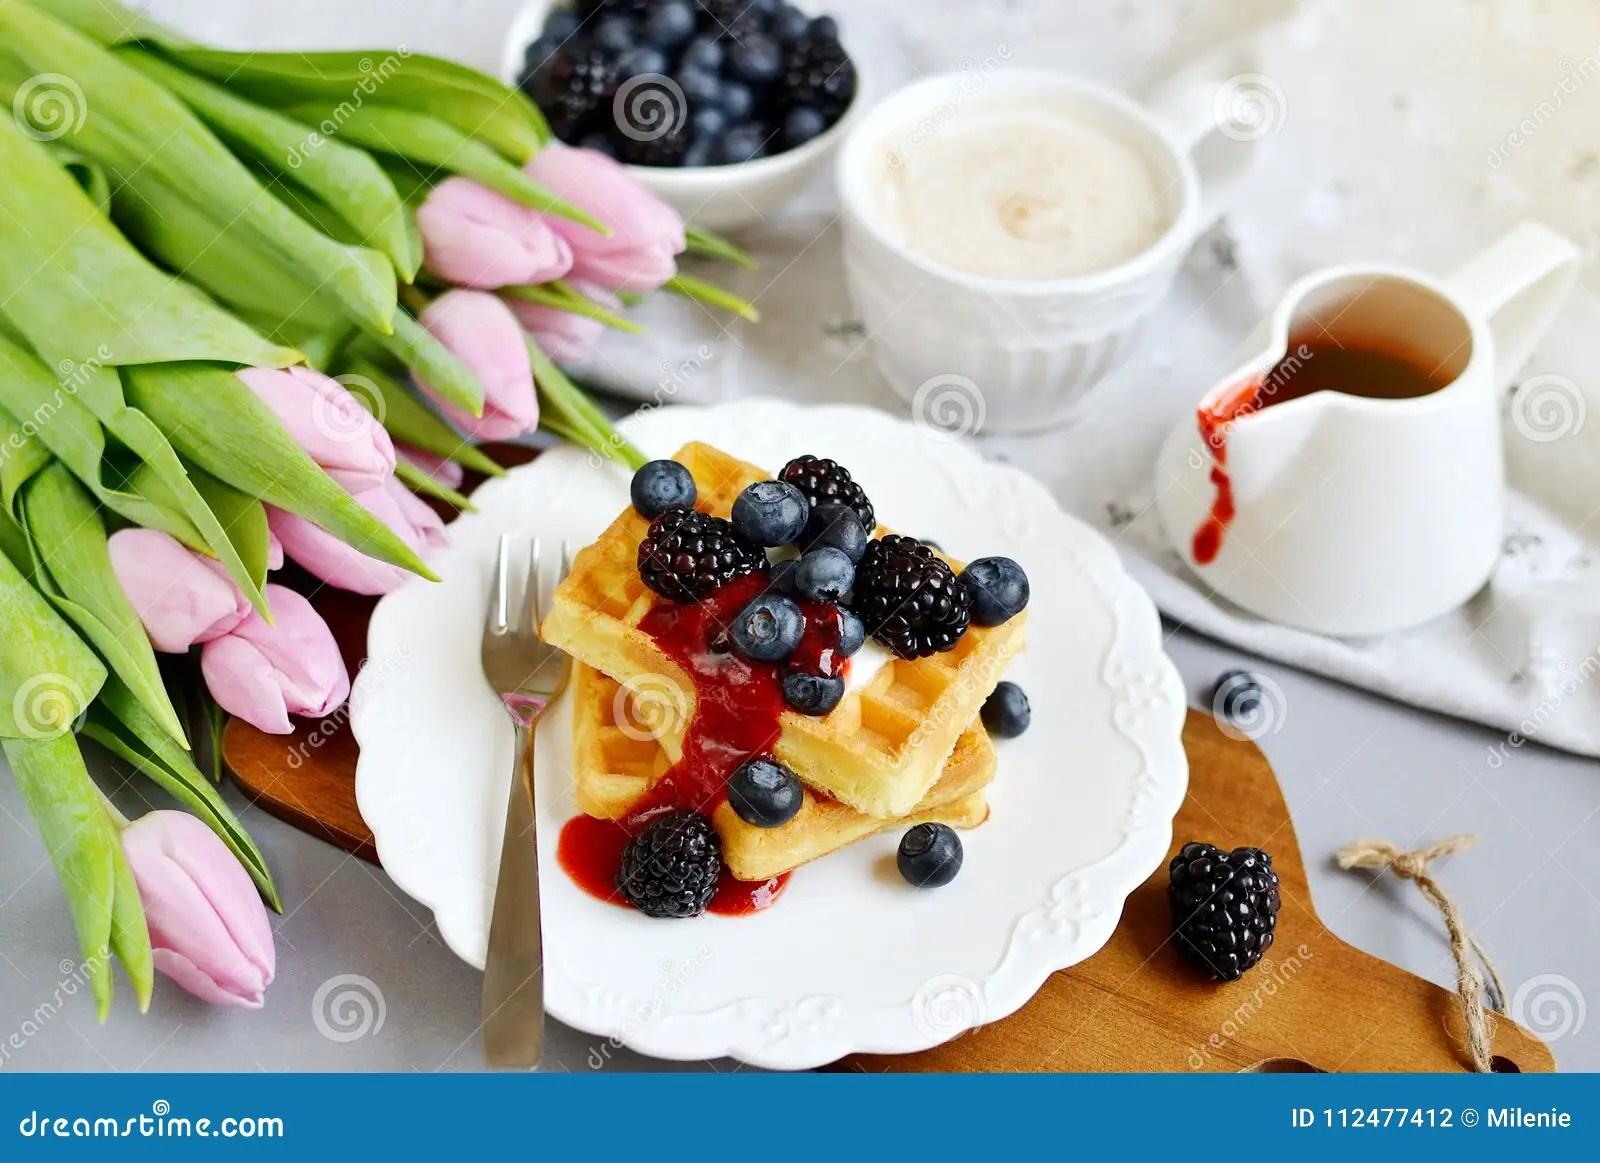 gray kitchen towels rohl faucet 自创比利时华夫饼干用奶油沙司莓果 杯用热奶咖啡饮料开花桃红色郁金香 灰色背景表厨房 毛巾白色板材 春天概念